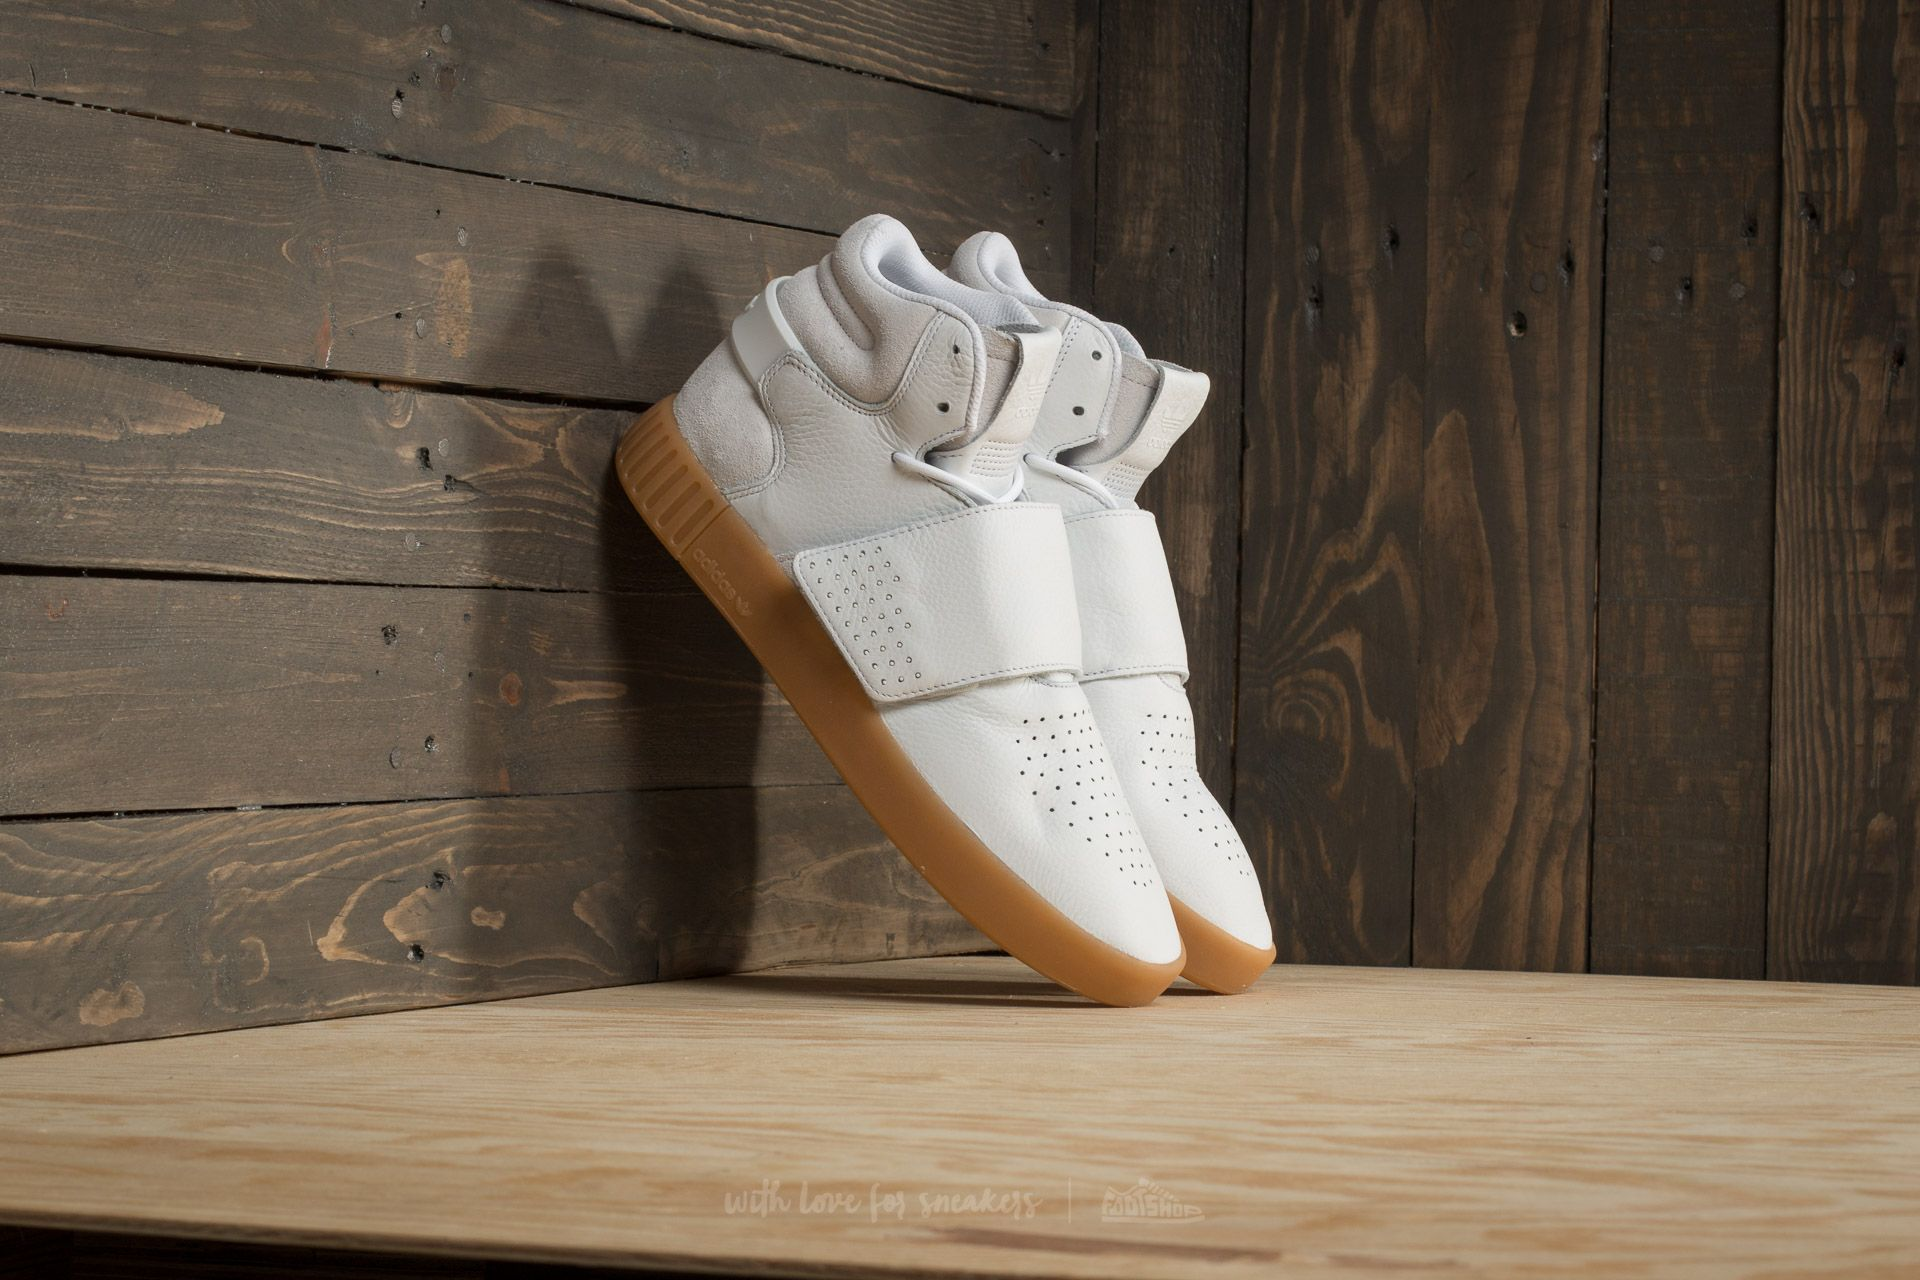 Strap Gum Footwear Black Tubular Invader Core Adidas White qwHTEnpnBf